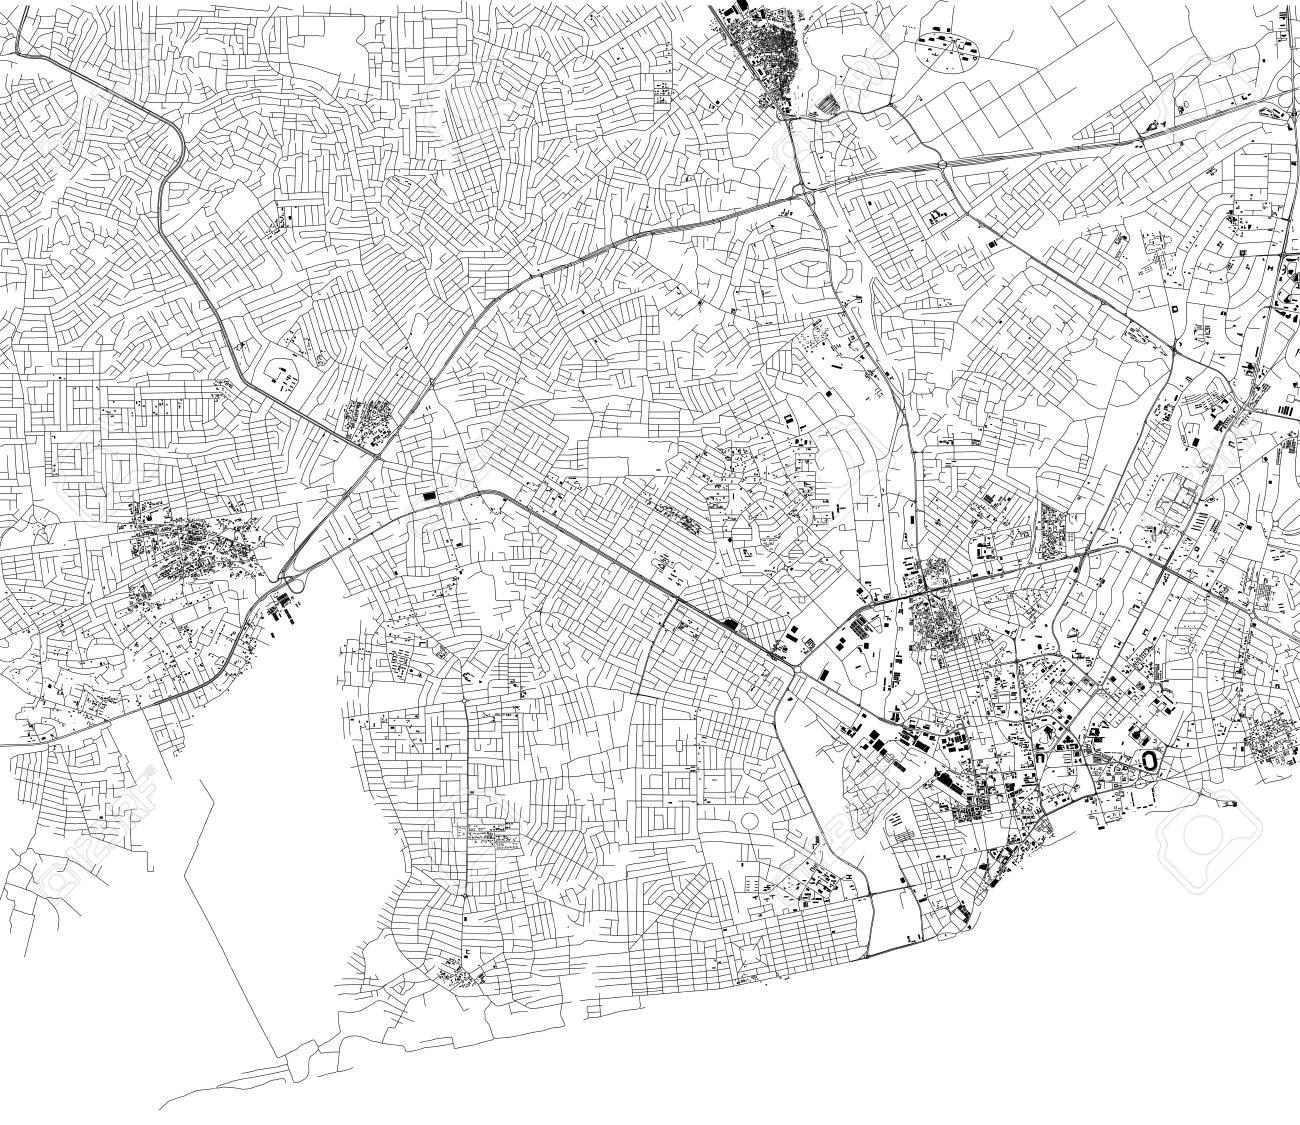 Map of Accra, satellite view, city, Ghana. Streets. Africa Satellite Map Of Ghana on towns and villages in ghana, swedru ghana, city of ghana, apartments in ghana, satellite view of ghana, satellite map kenya, republic of ghana, district in volta ghana, food of ghana, capital of ghana, western ghana, eastern region ghana, akuse ghana, street view of ghana, aerial view of ghana, nzema ghana, volta region ghana, russia of ghana, fashion of ghana, village of ghana,